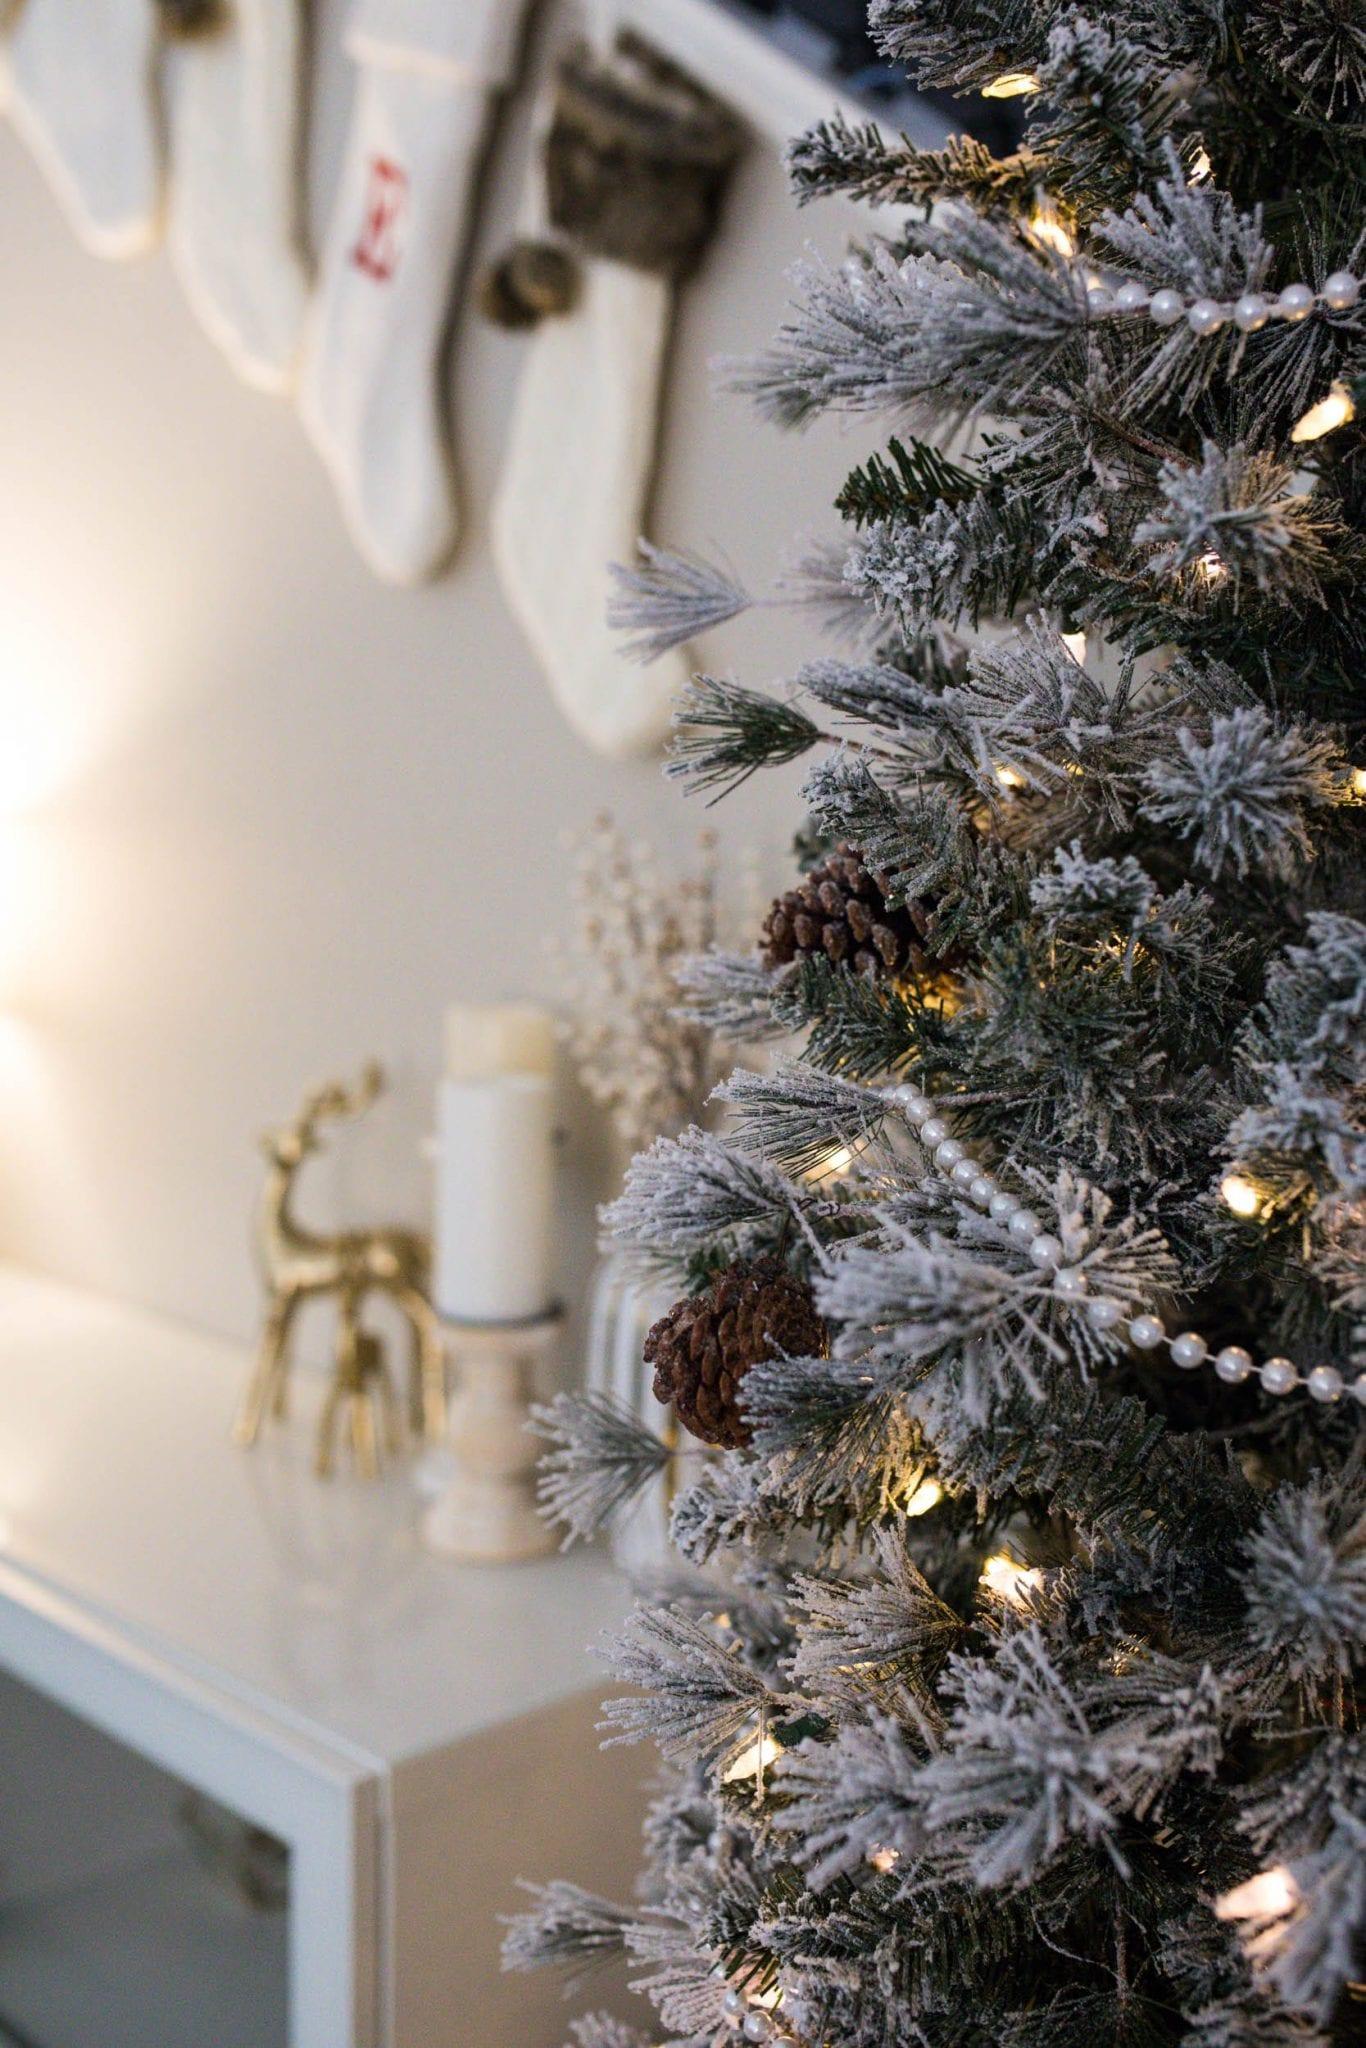 holiday home tour ideas | holiday home tour inspiration | christmas lights ideas | holiday decor christmas | christmas lights indoor living rooms | never skip brunch by cara newhart #decor #christmas #holiday